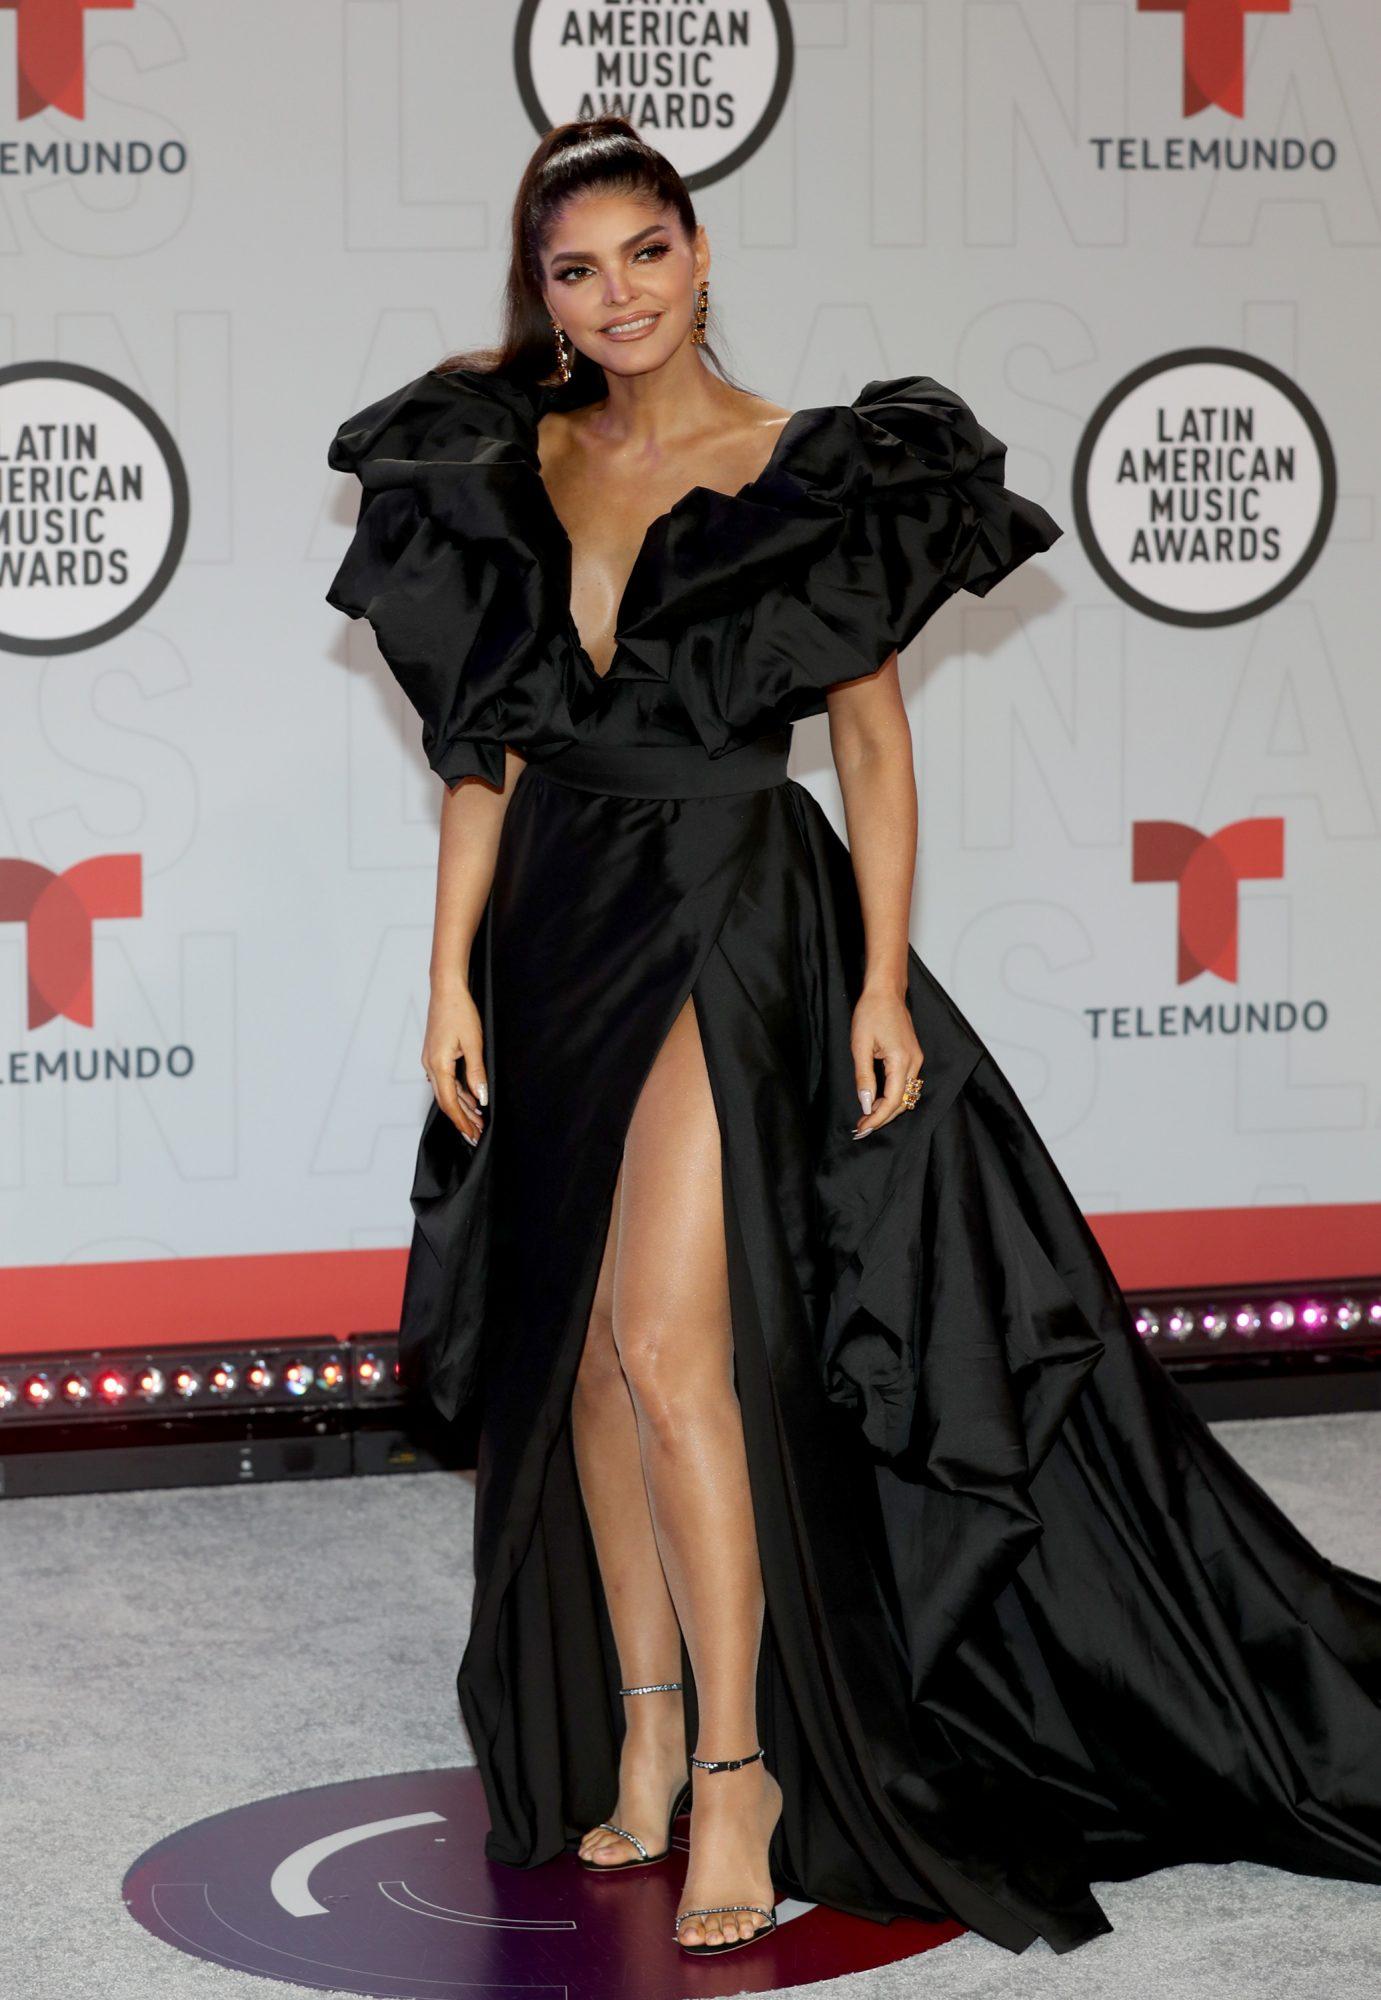 Ana Barbara, Latin American Music Awards, vestido negro